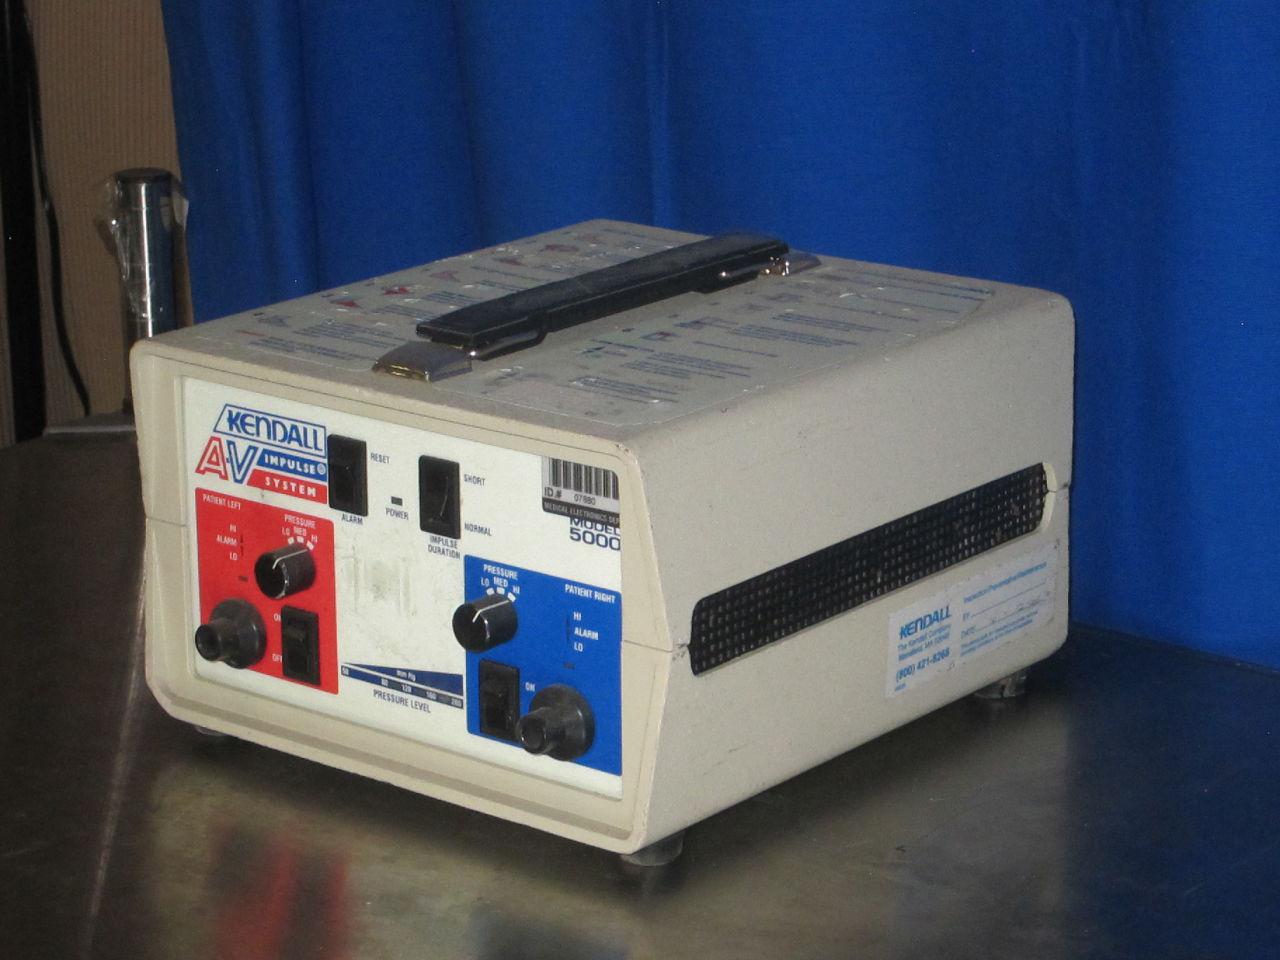 KENDALL Model 5000 Pump Vascular Compression